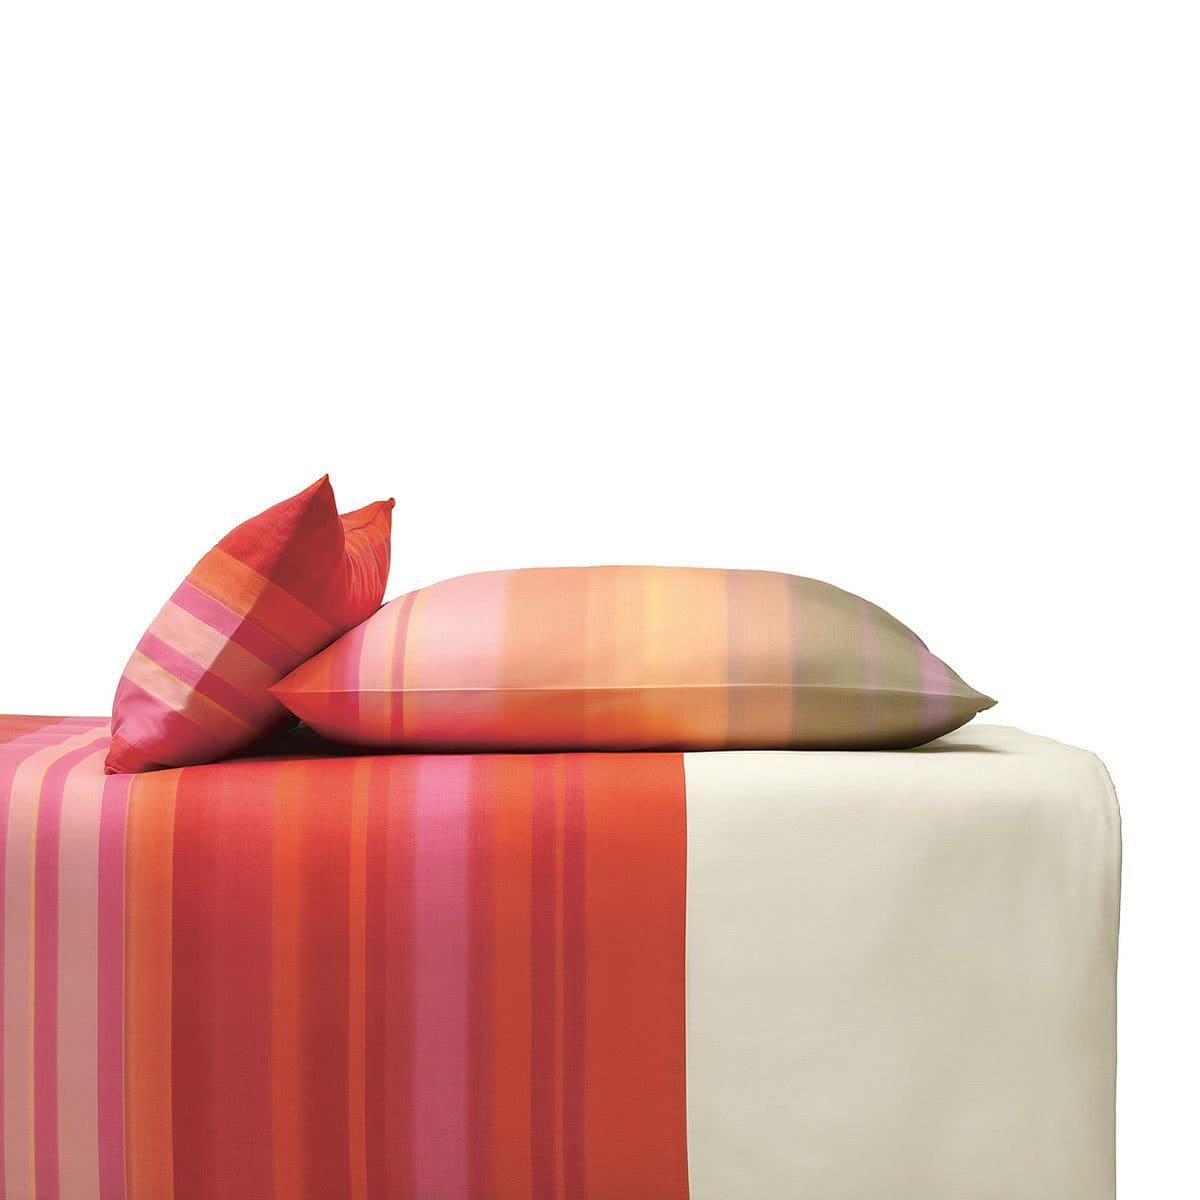 cotonea mako satin bettw sche abendrot g nstig online kaufen bei bettwaren shop. Black Bedroom Furniture Sets. Home Design Ideas